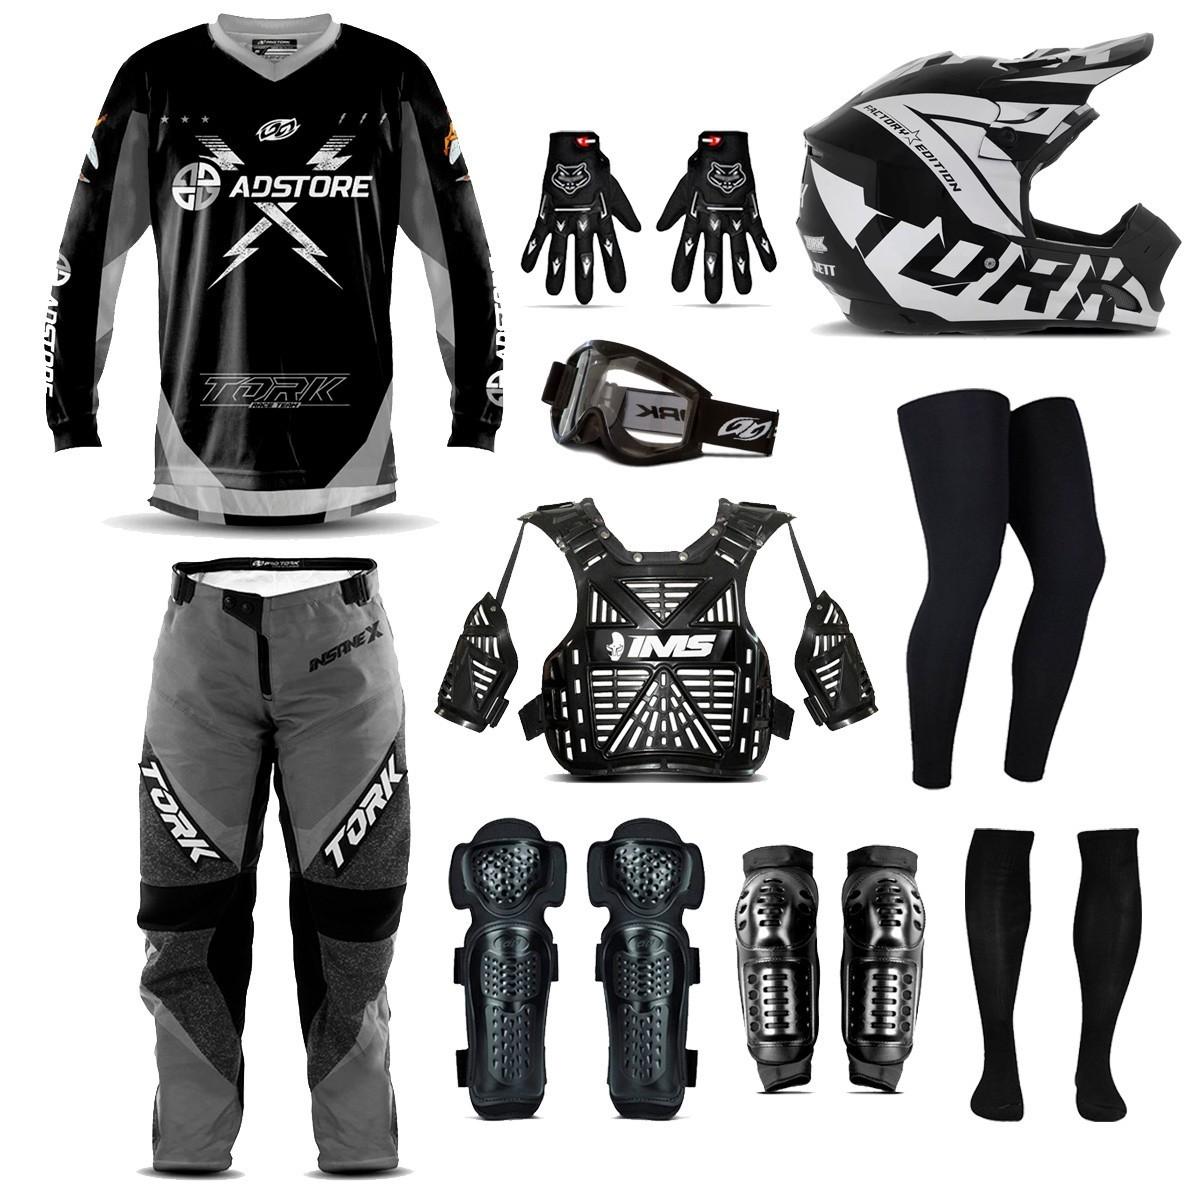 Kit Equipamento 10 Itens Conjunto Motocross Trilha Ad Store X Cinza Factory Edition